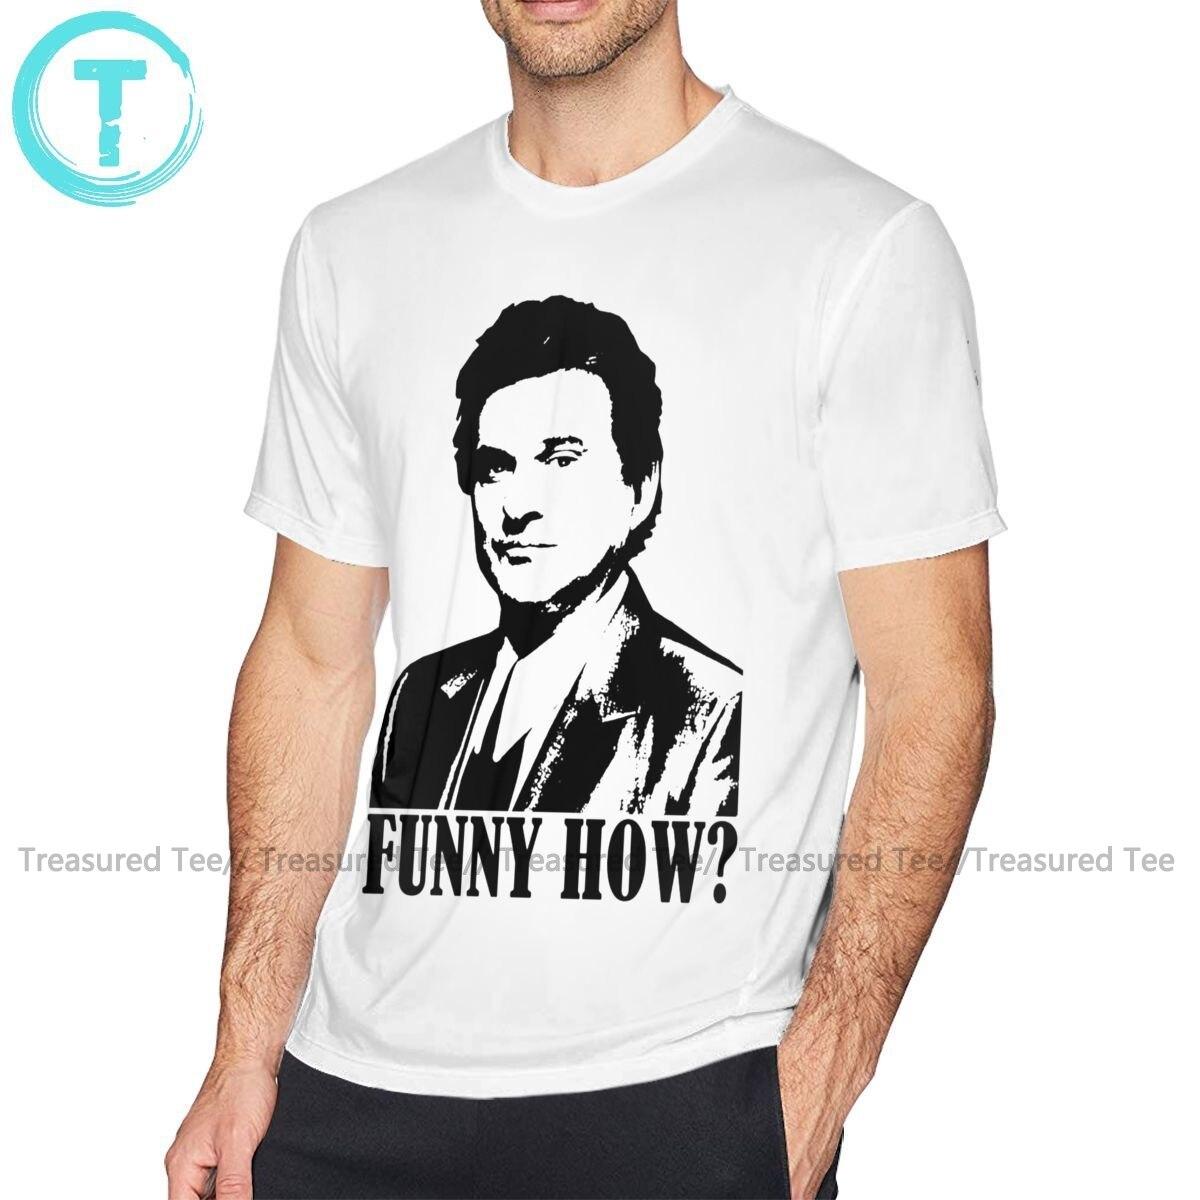 Camiseta goodfells, camiseta divertida con estampado de Good Fells, Joe Pesci, camiseta grande para hombre, camiseta 100 de algodón